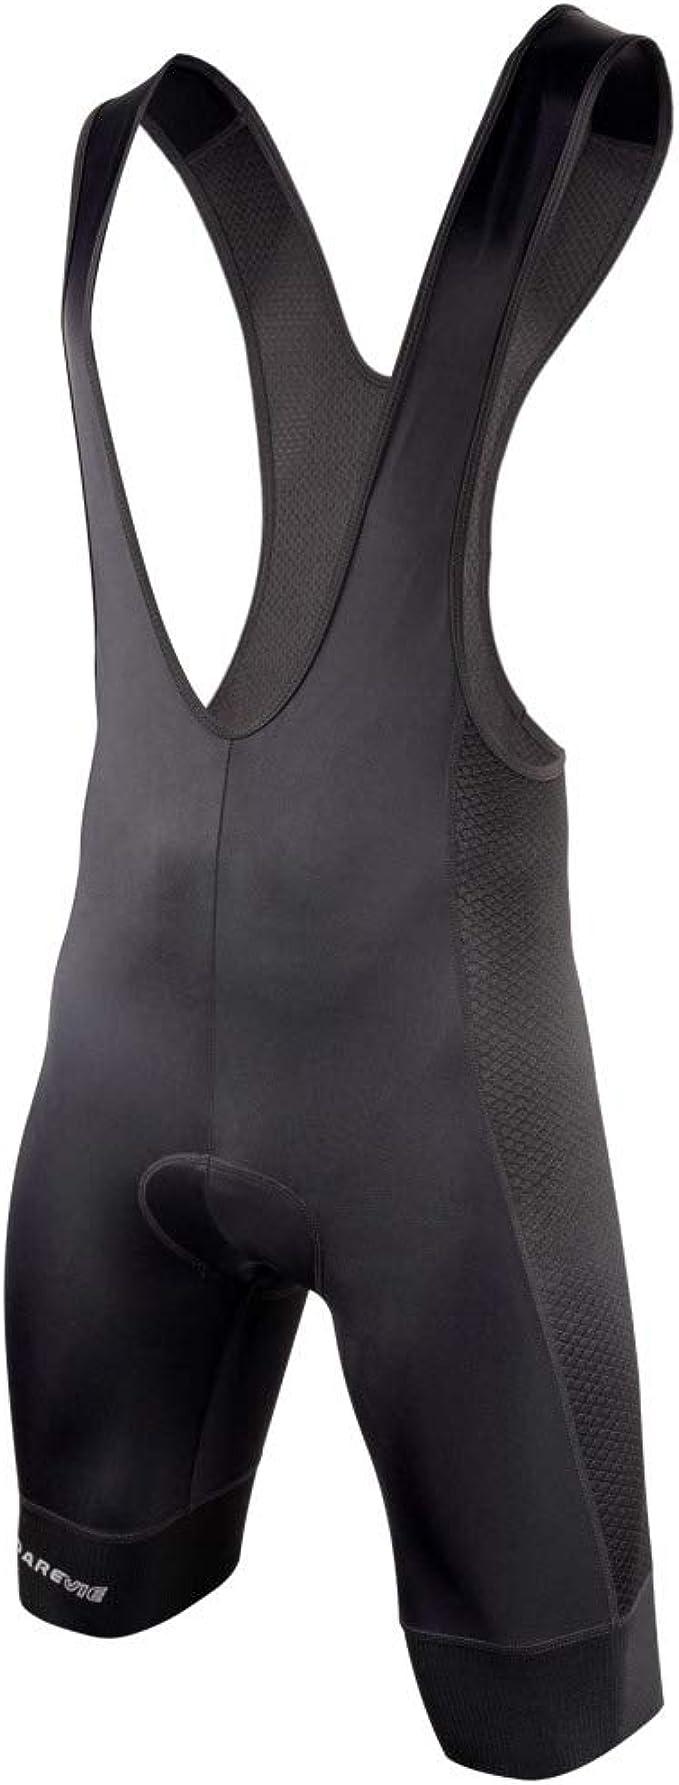 "Acolchados 3D para Montar en Bicicleta Negro X-Large /""N//A/"" Pantalones Cortos de Ciclismo para Mujer"